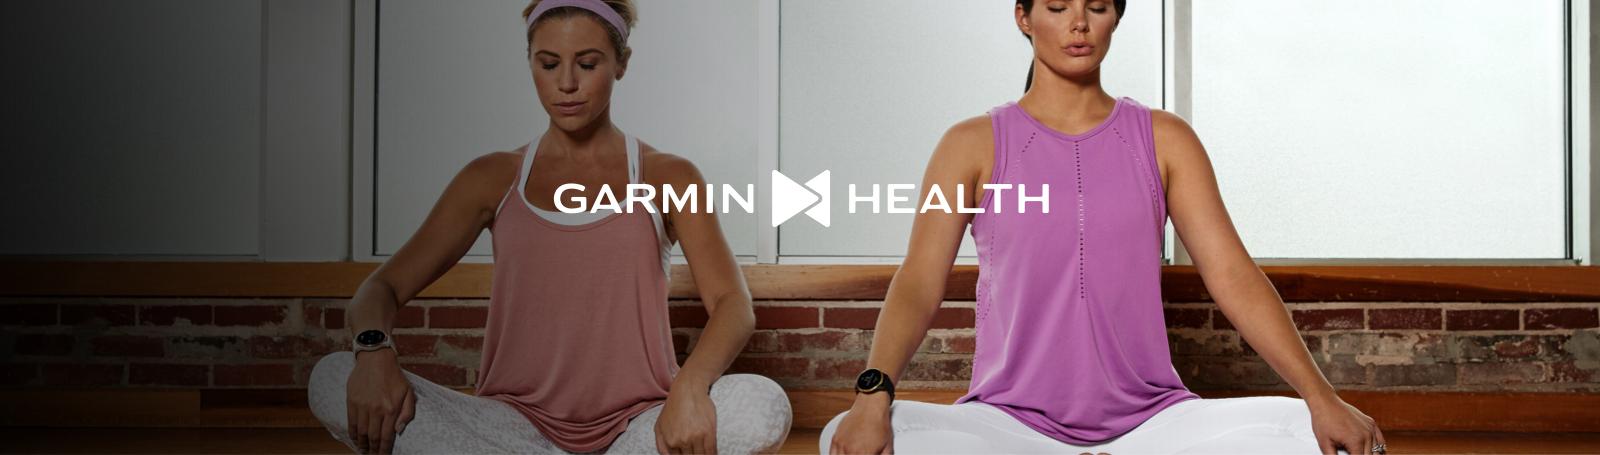 Garmin Health